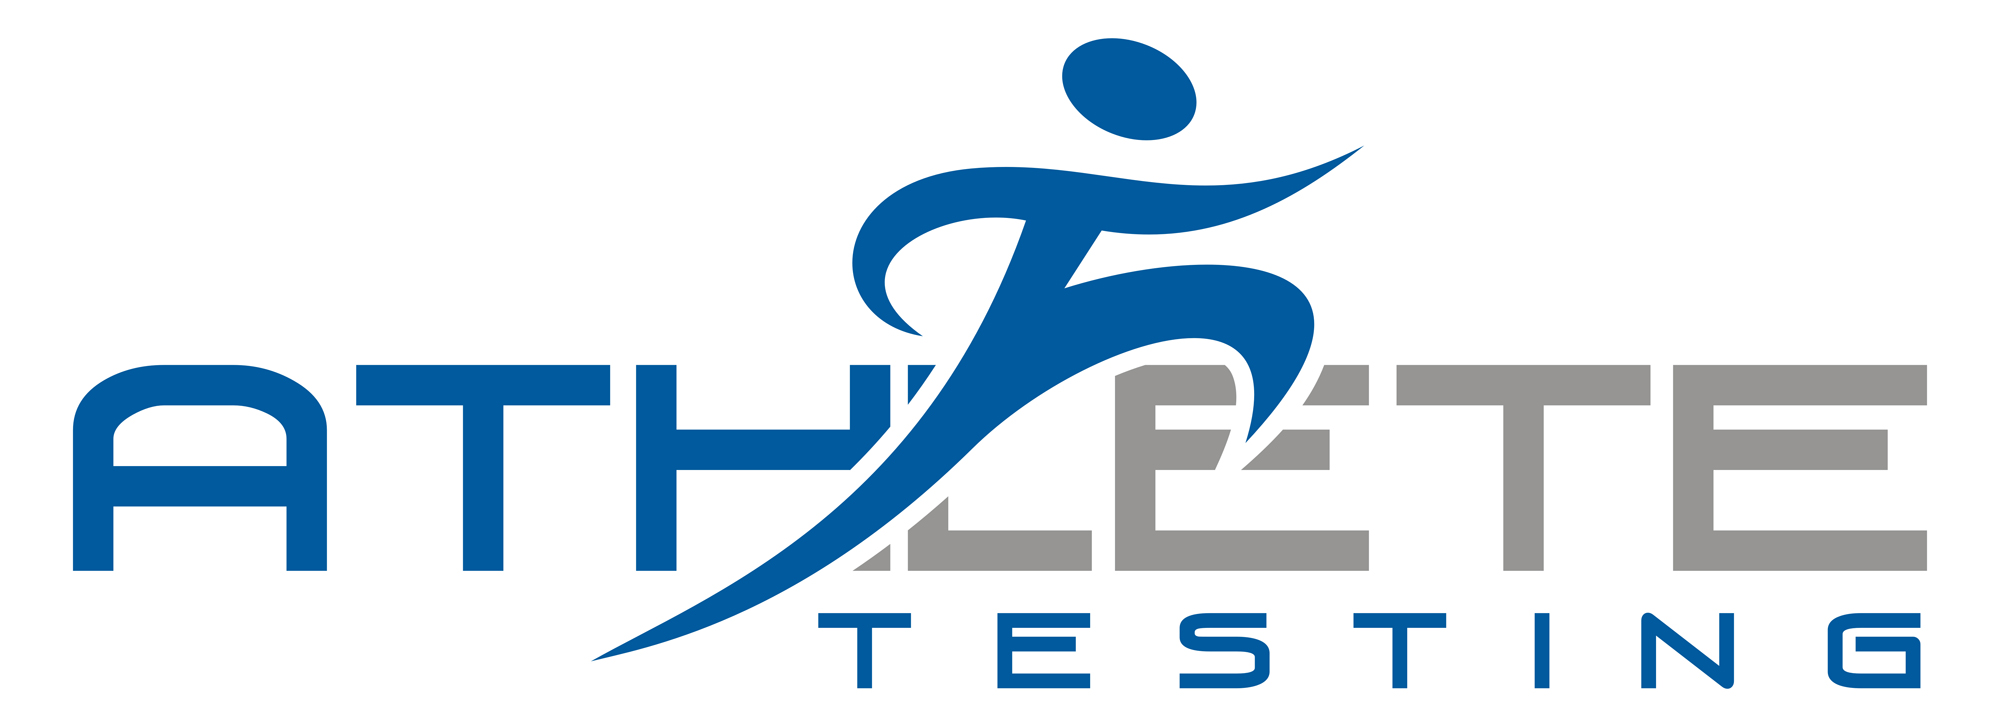 Отрисовка логотипа logo-design-249